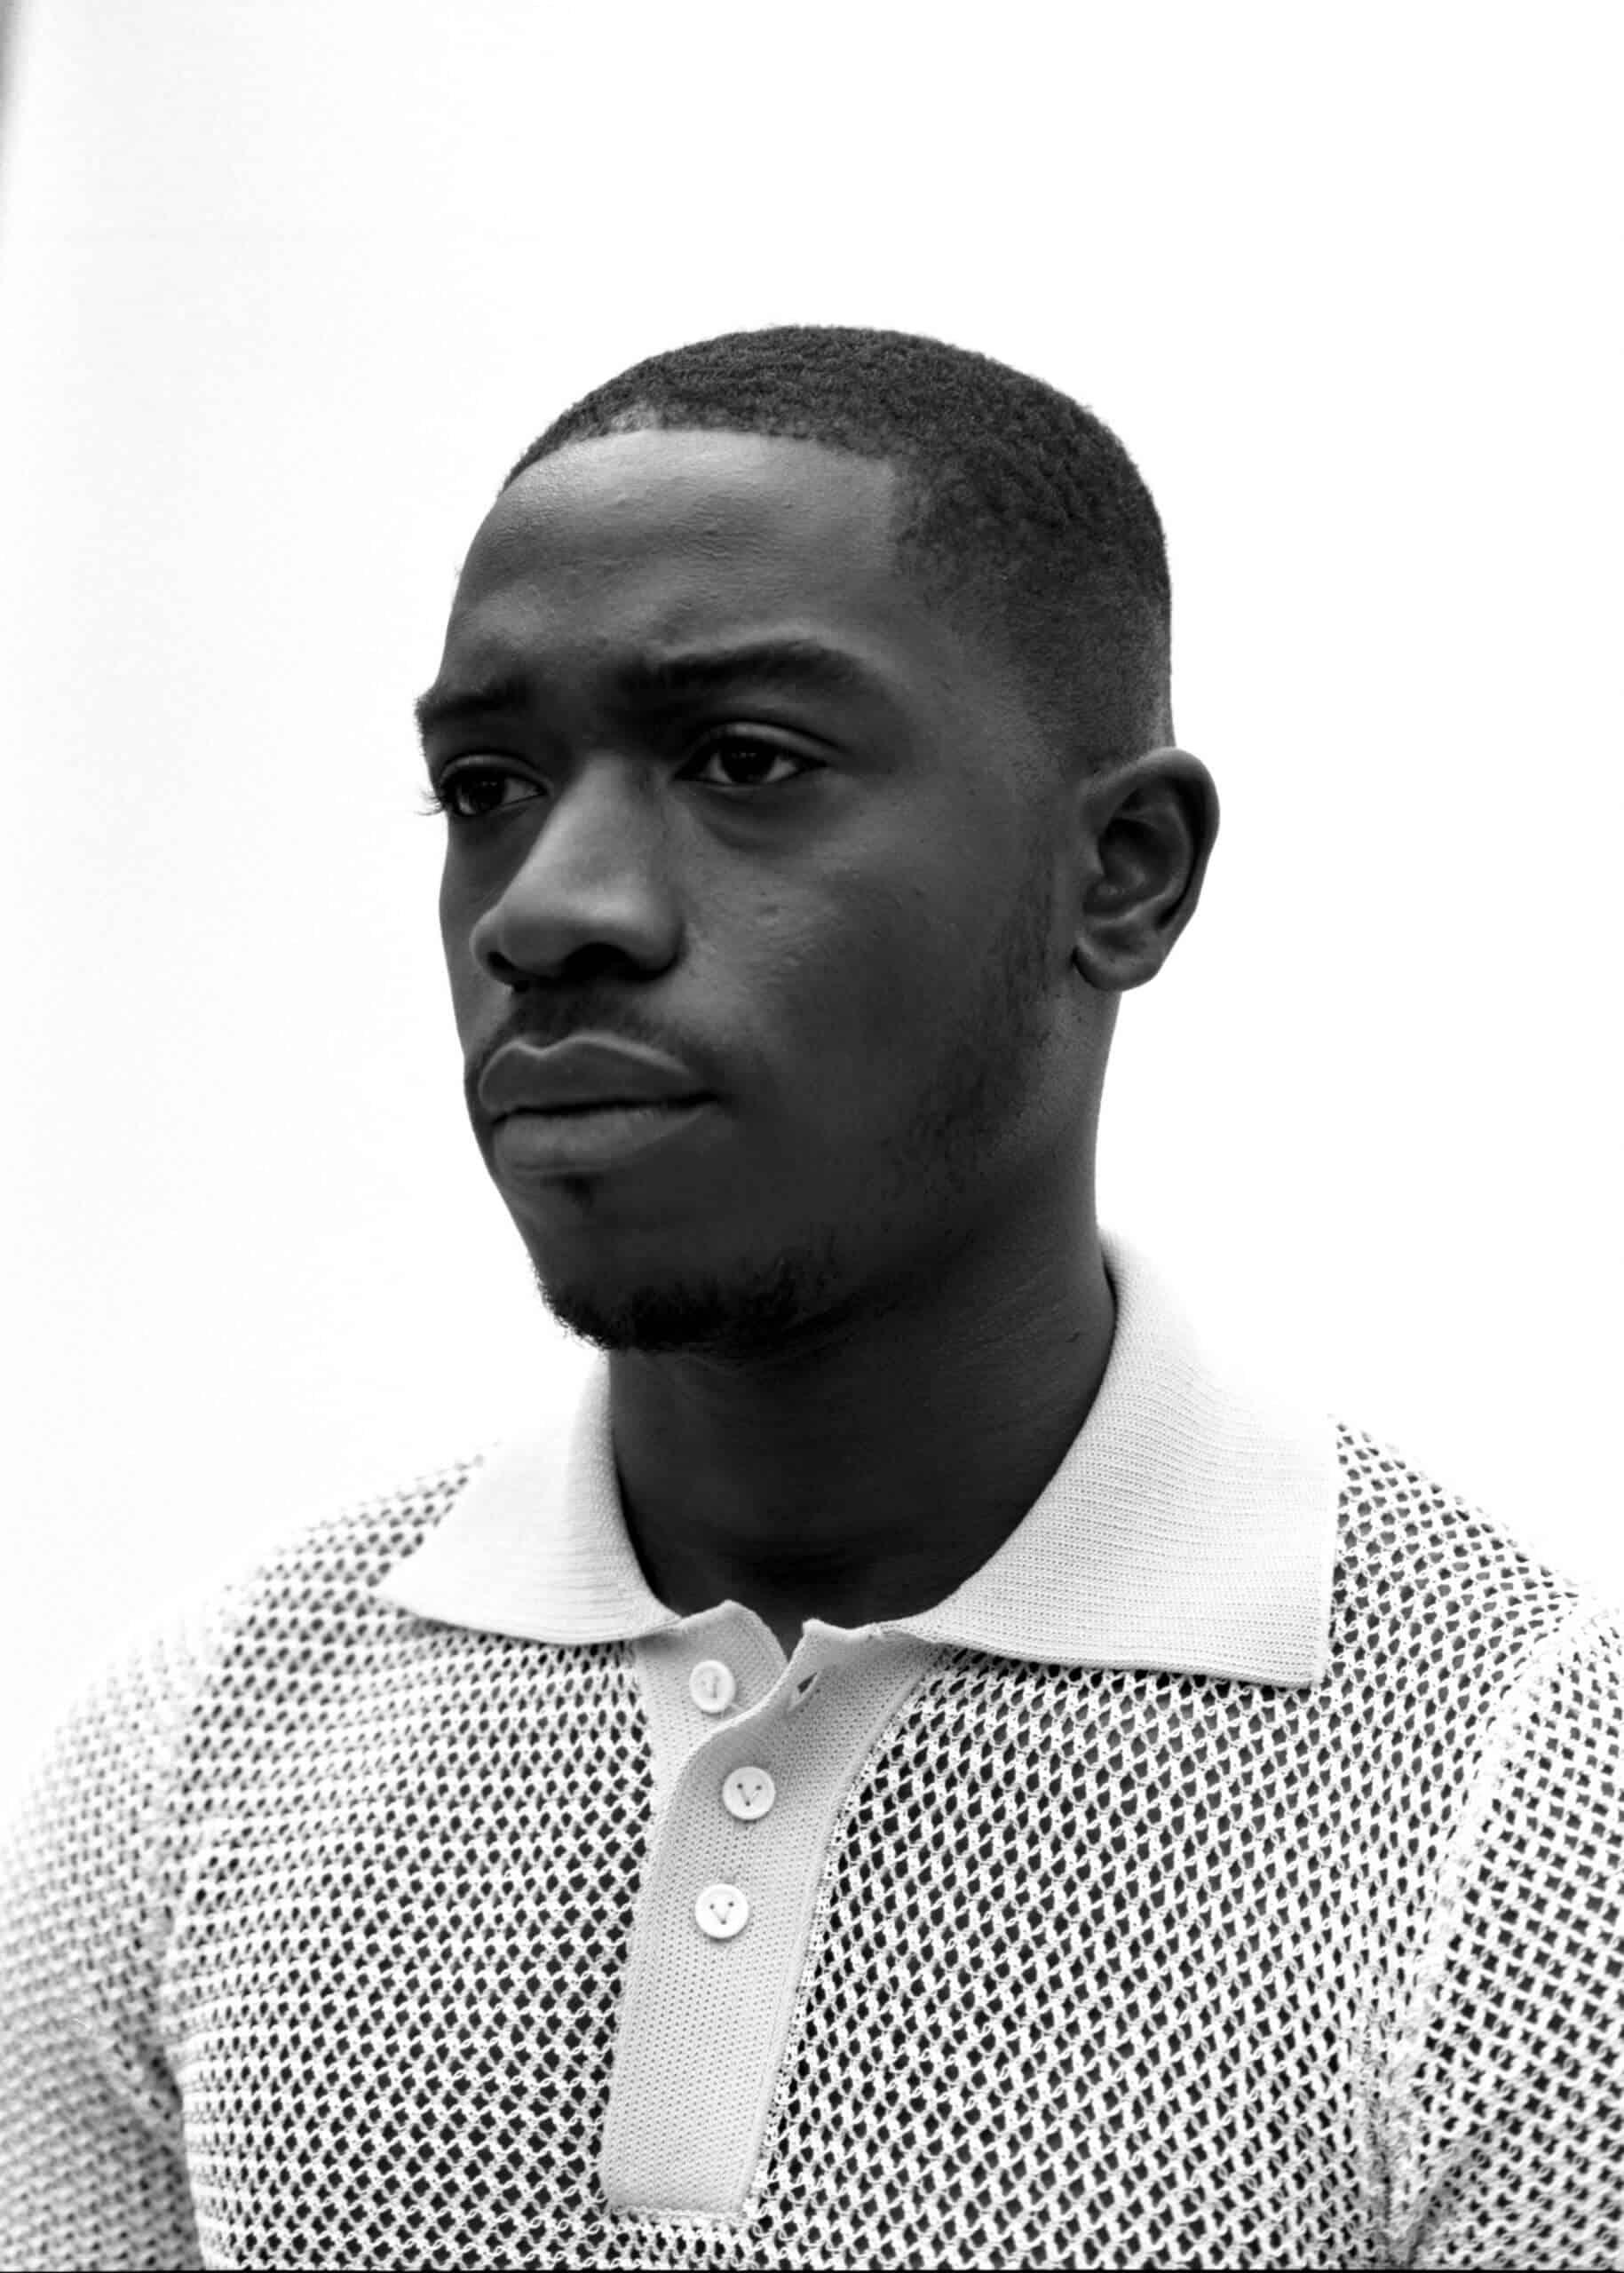 Damson Idris, The Connect